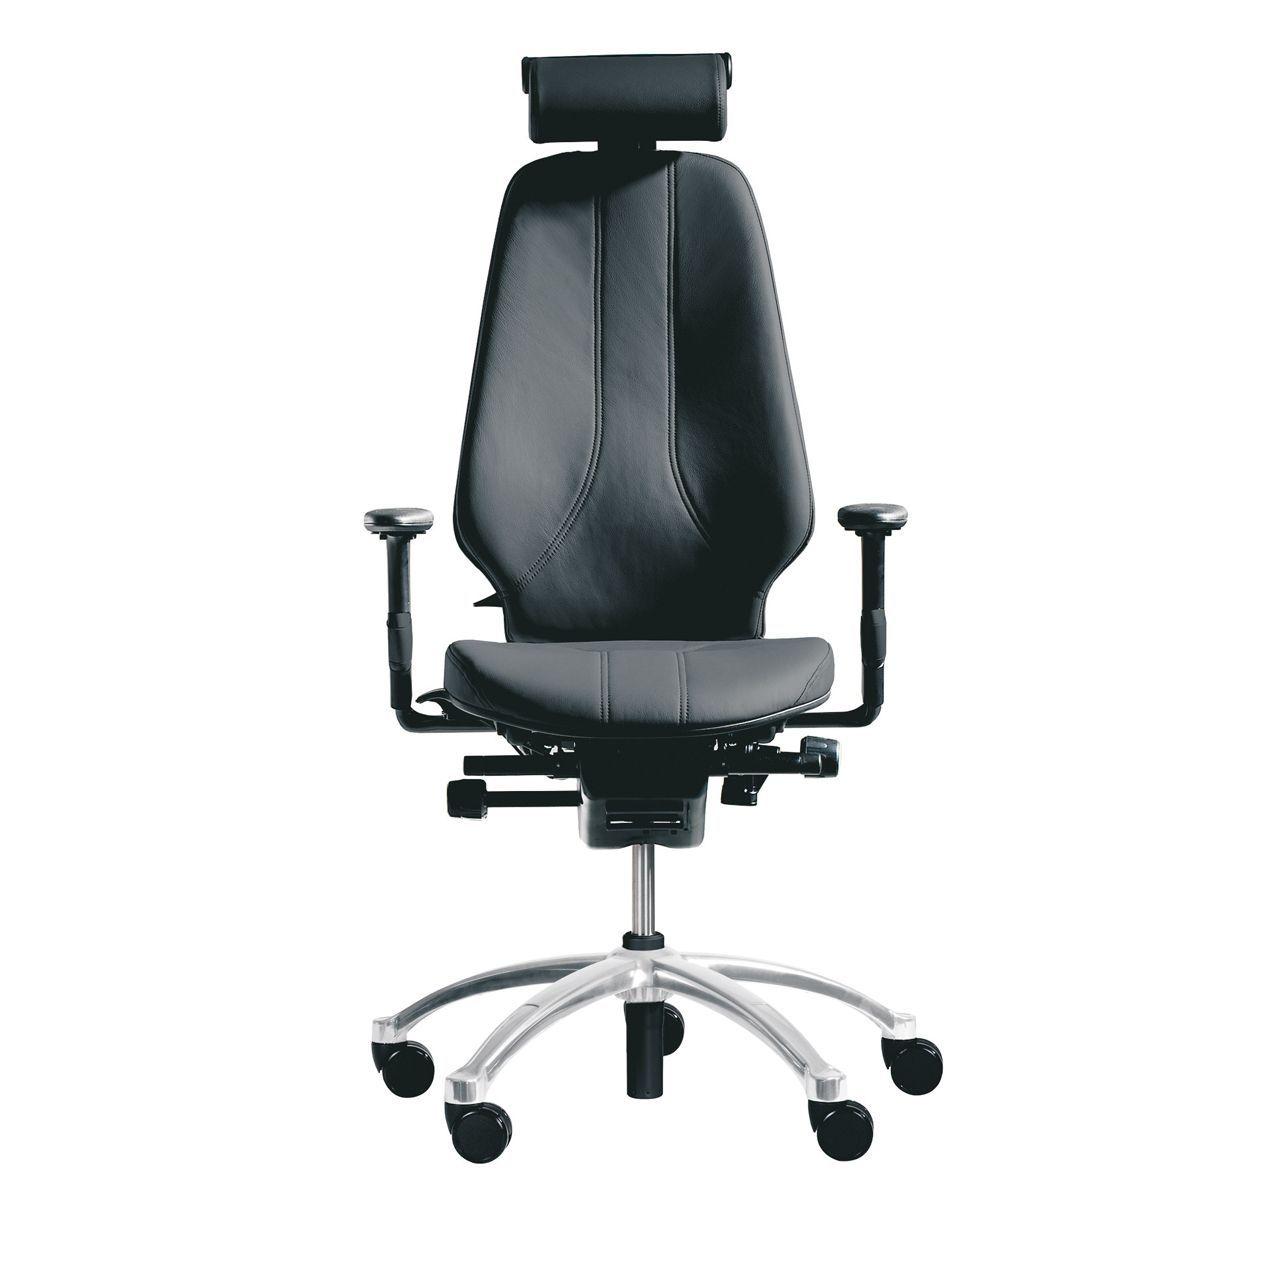 rh logic 400 24 7 ergonomische bureaustoel STKARH303 Leer